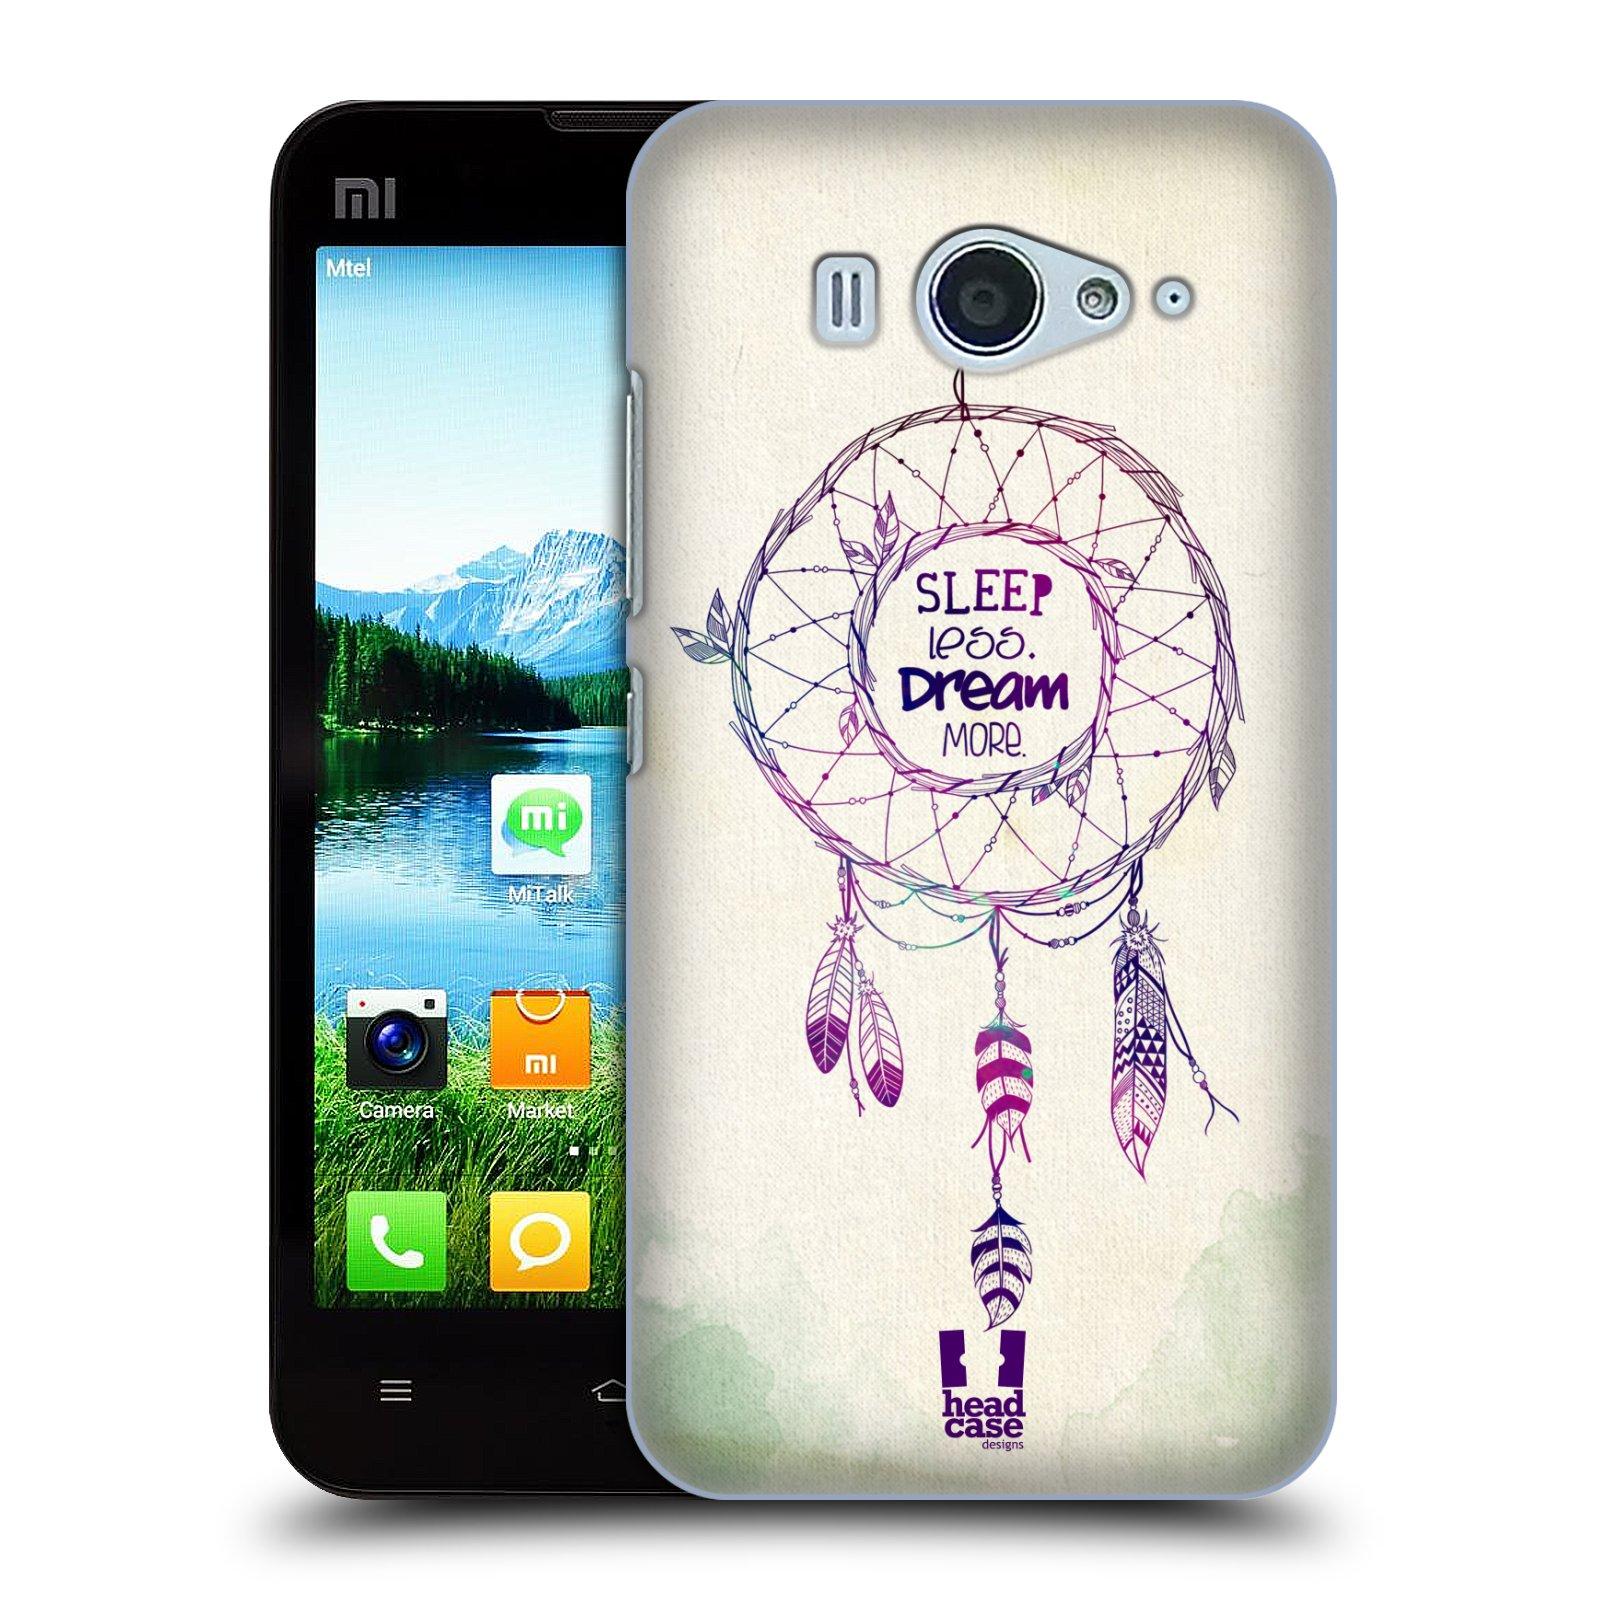 HEAD CASE pevný plastový obal na mobil XIAOMI MI2s vzor Lapač snů ZELENÁ A FIALOVÁ